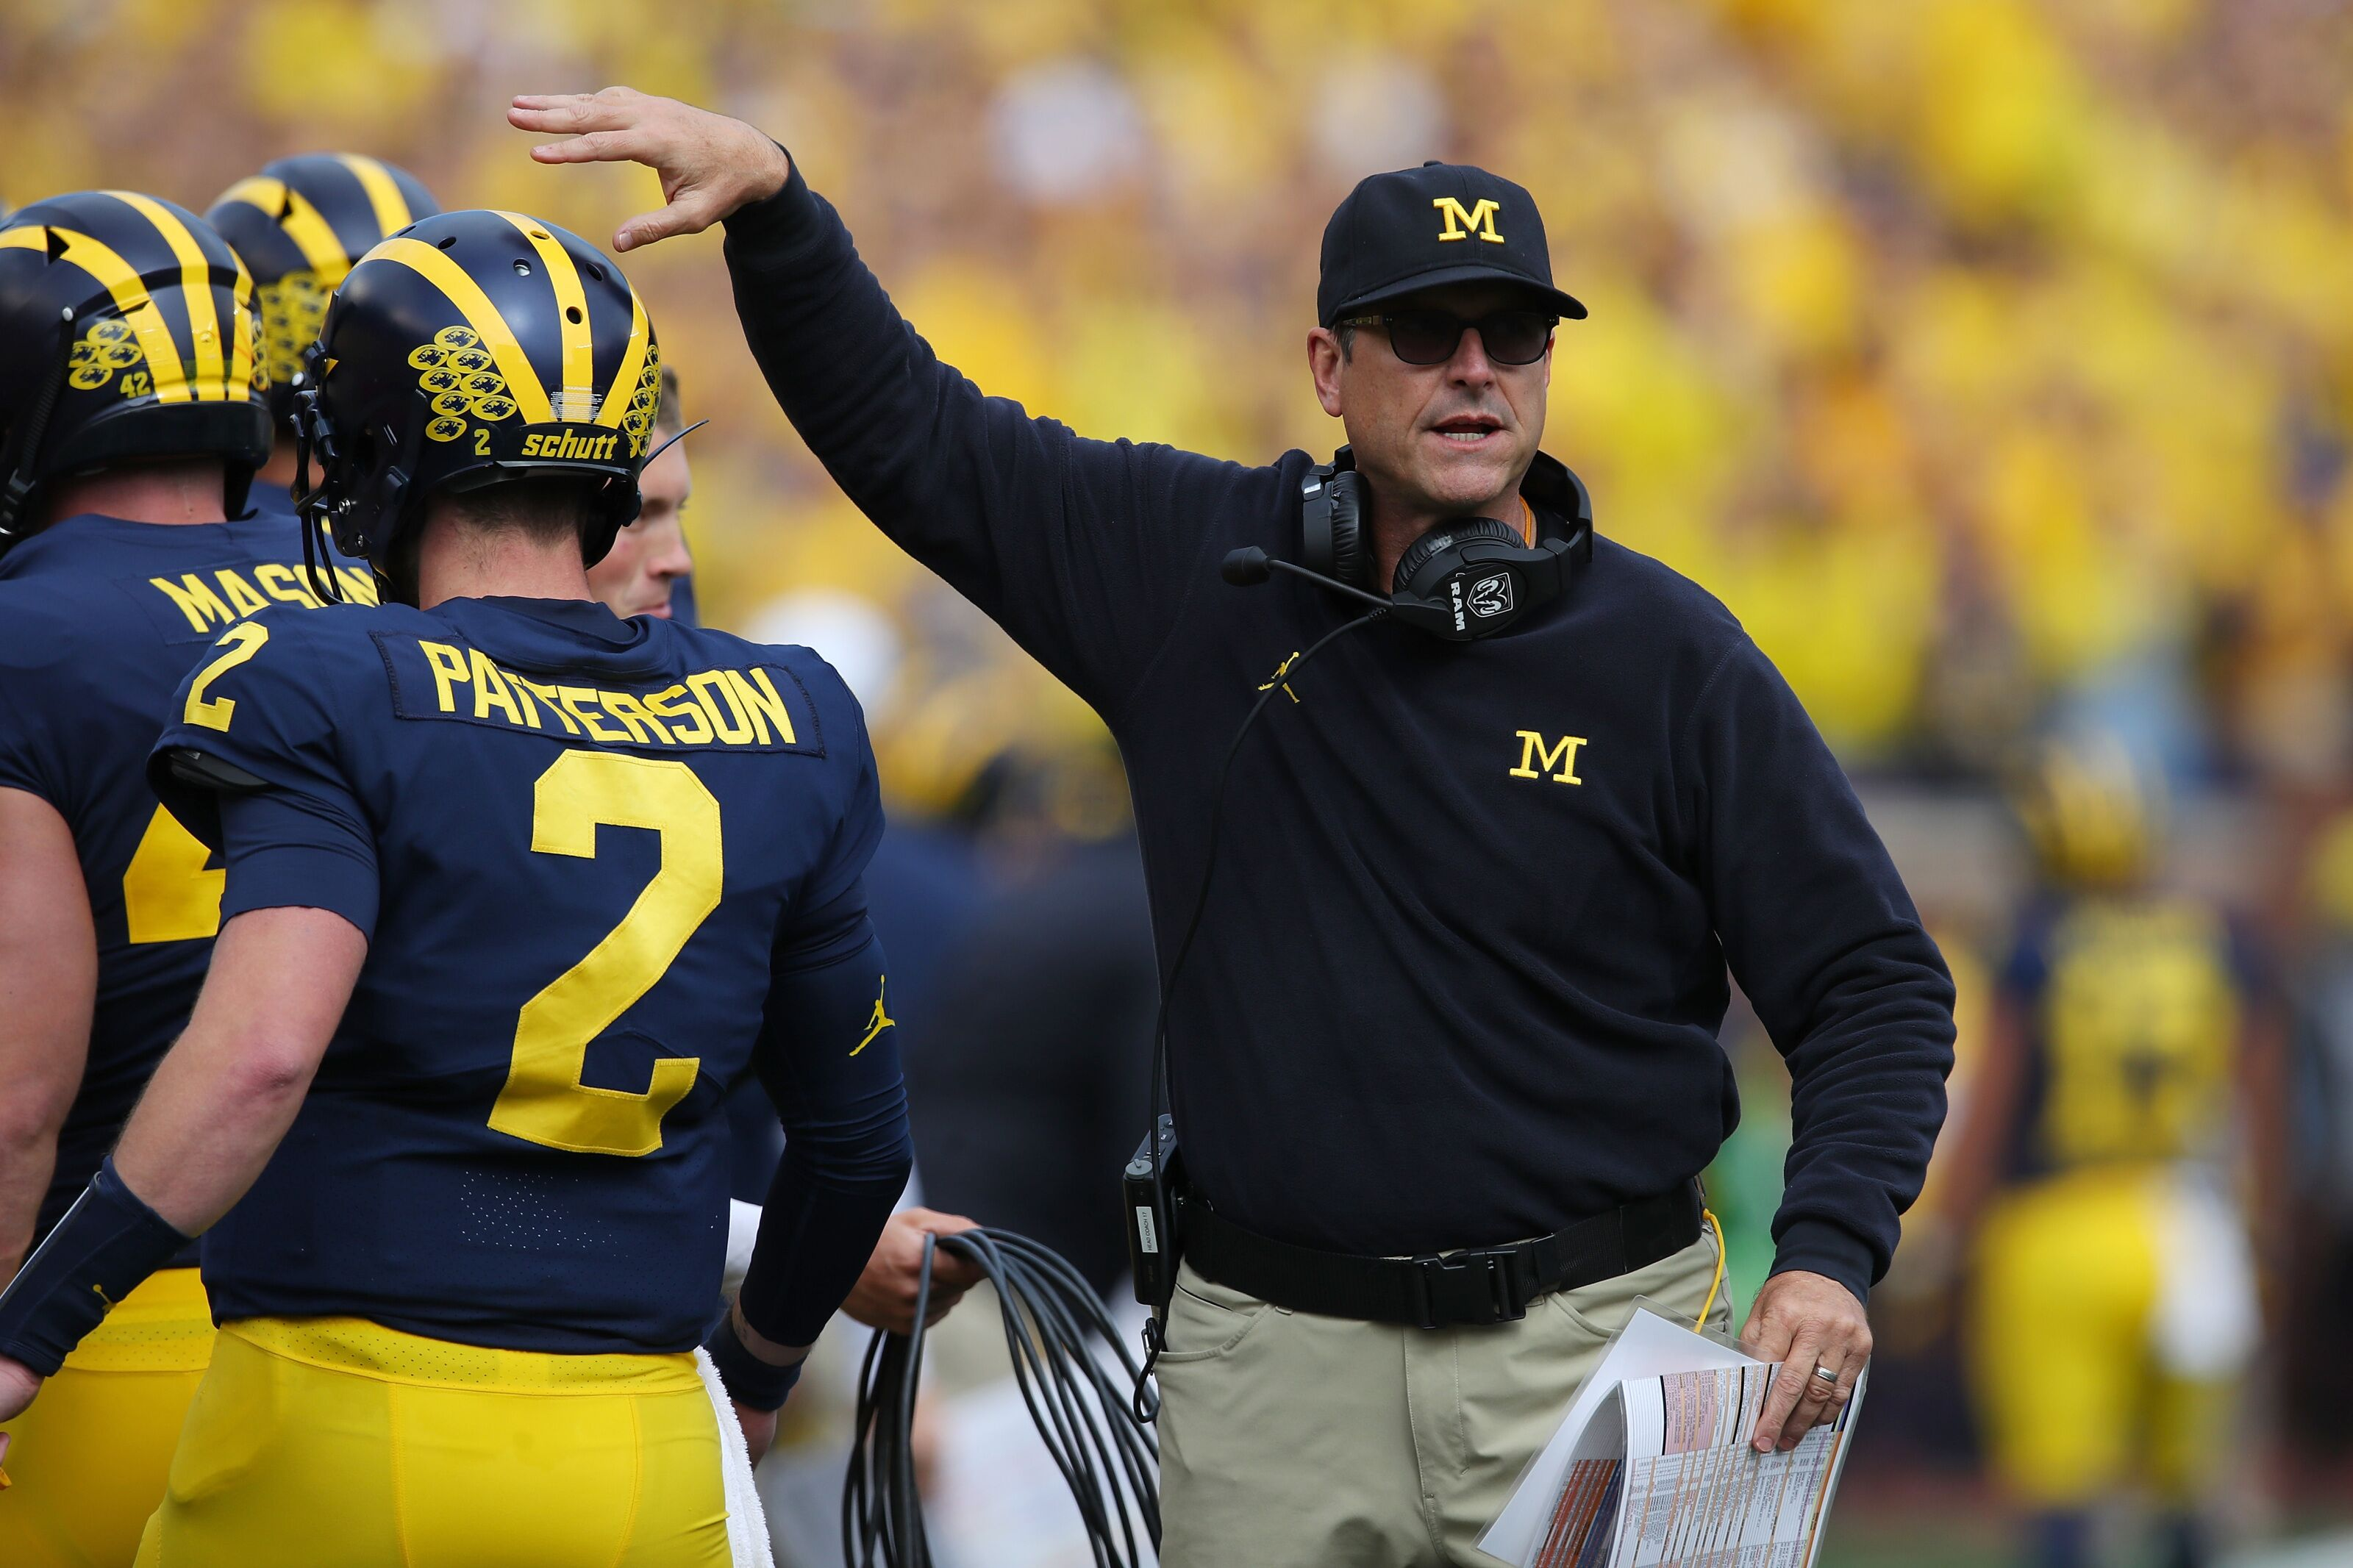 Michigan Football: Latest on 4-star Theo Johnson and possible 2020 QB